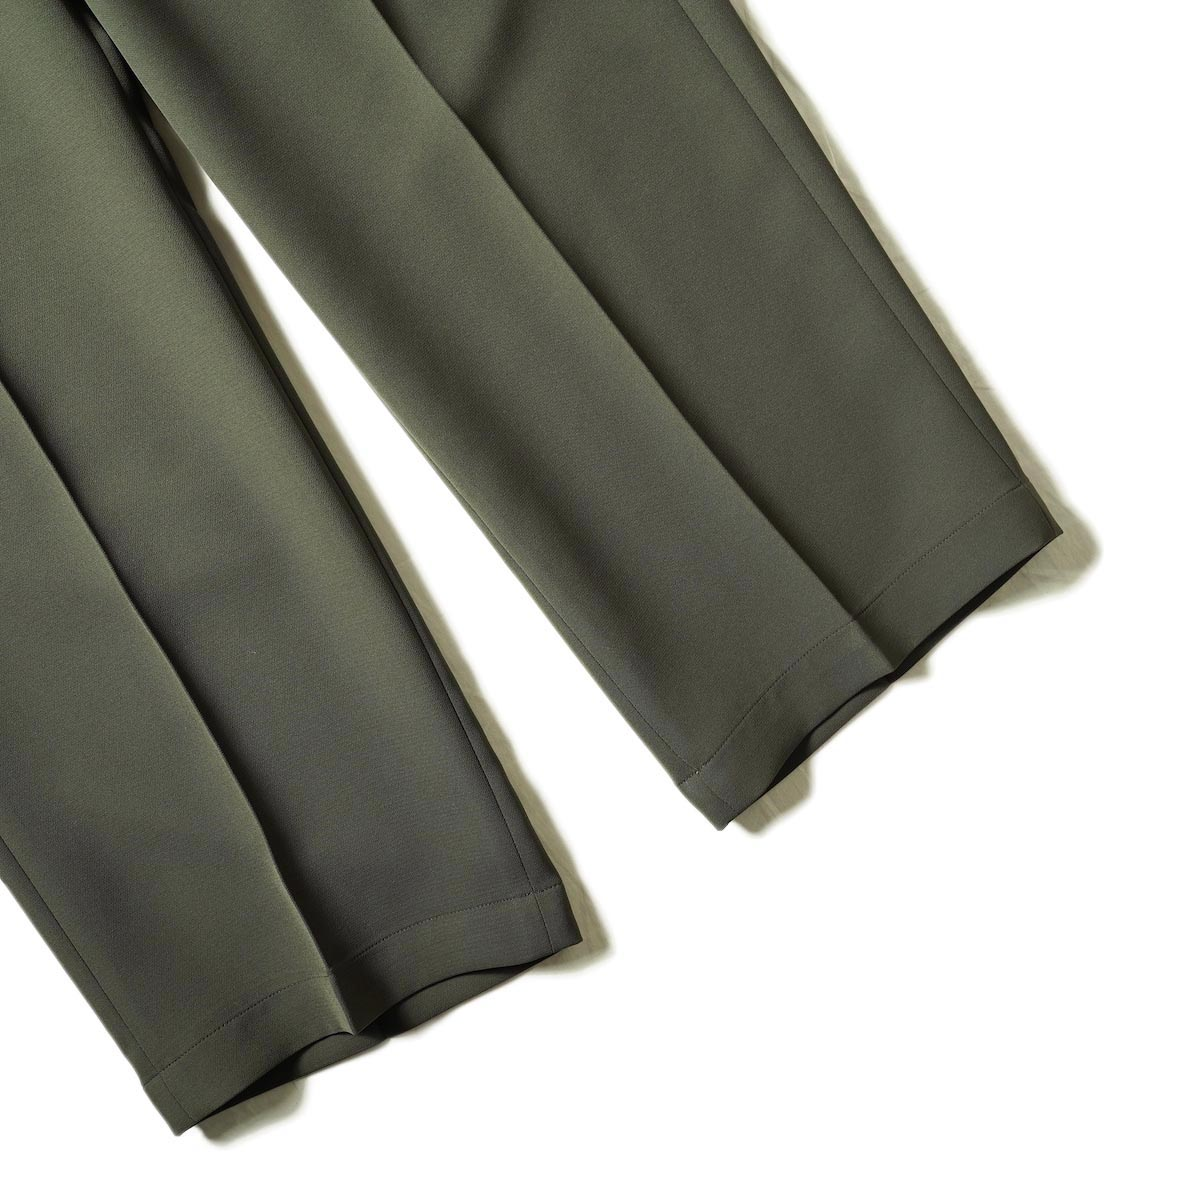 N.HOOLYWOOD / 2212-PT06-098 Wide Tapered Easy Slacks (Charcoal)裾